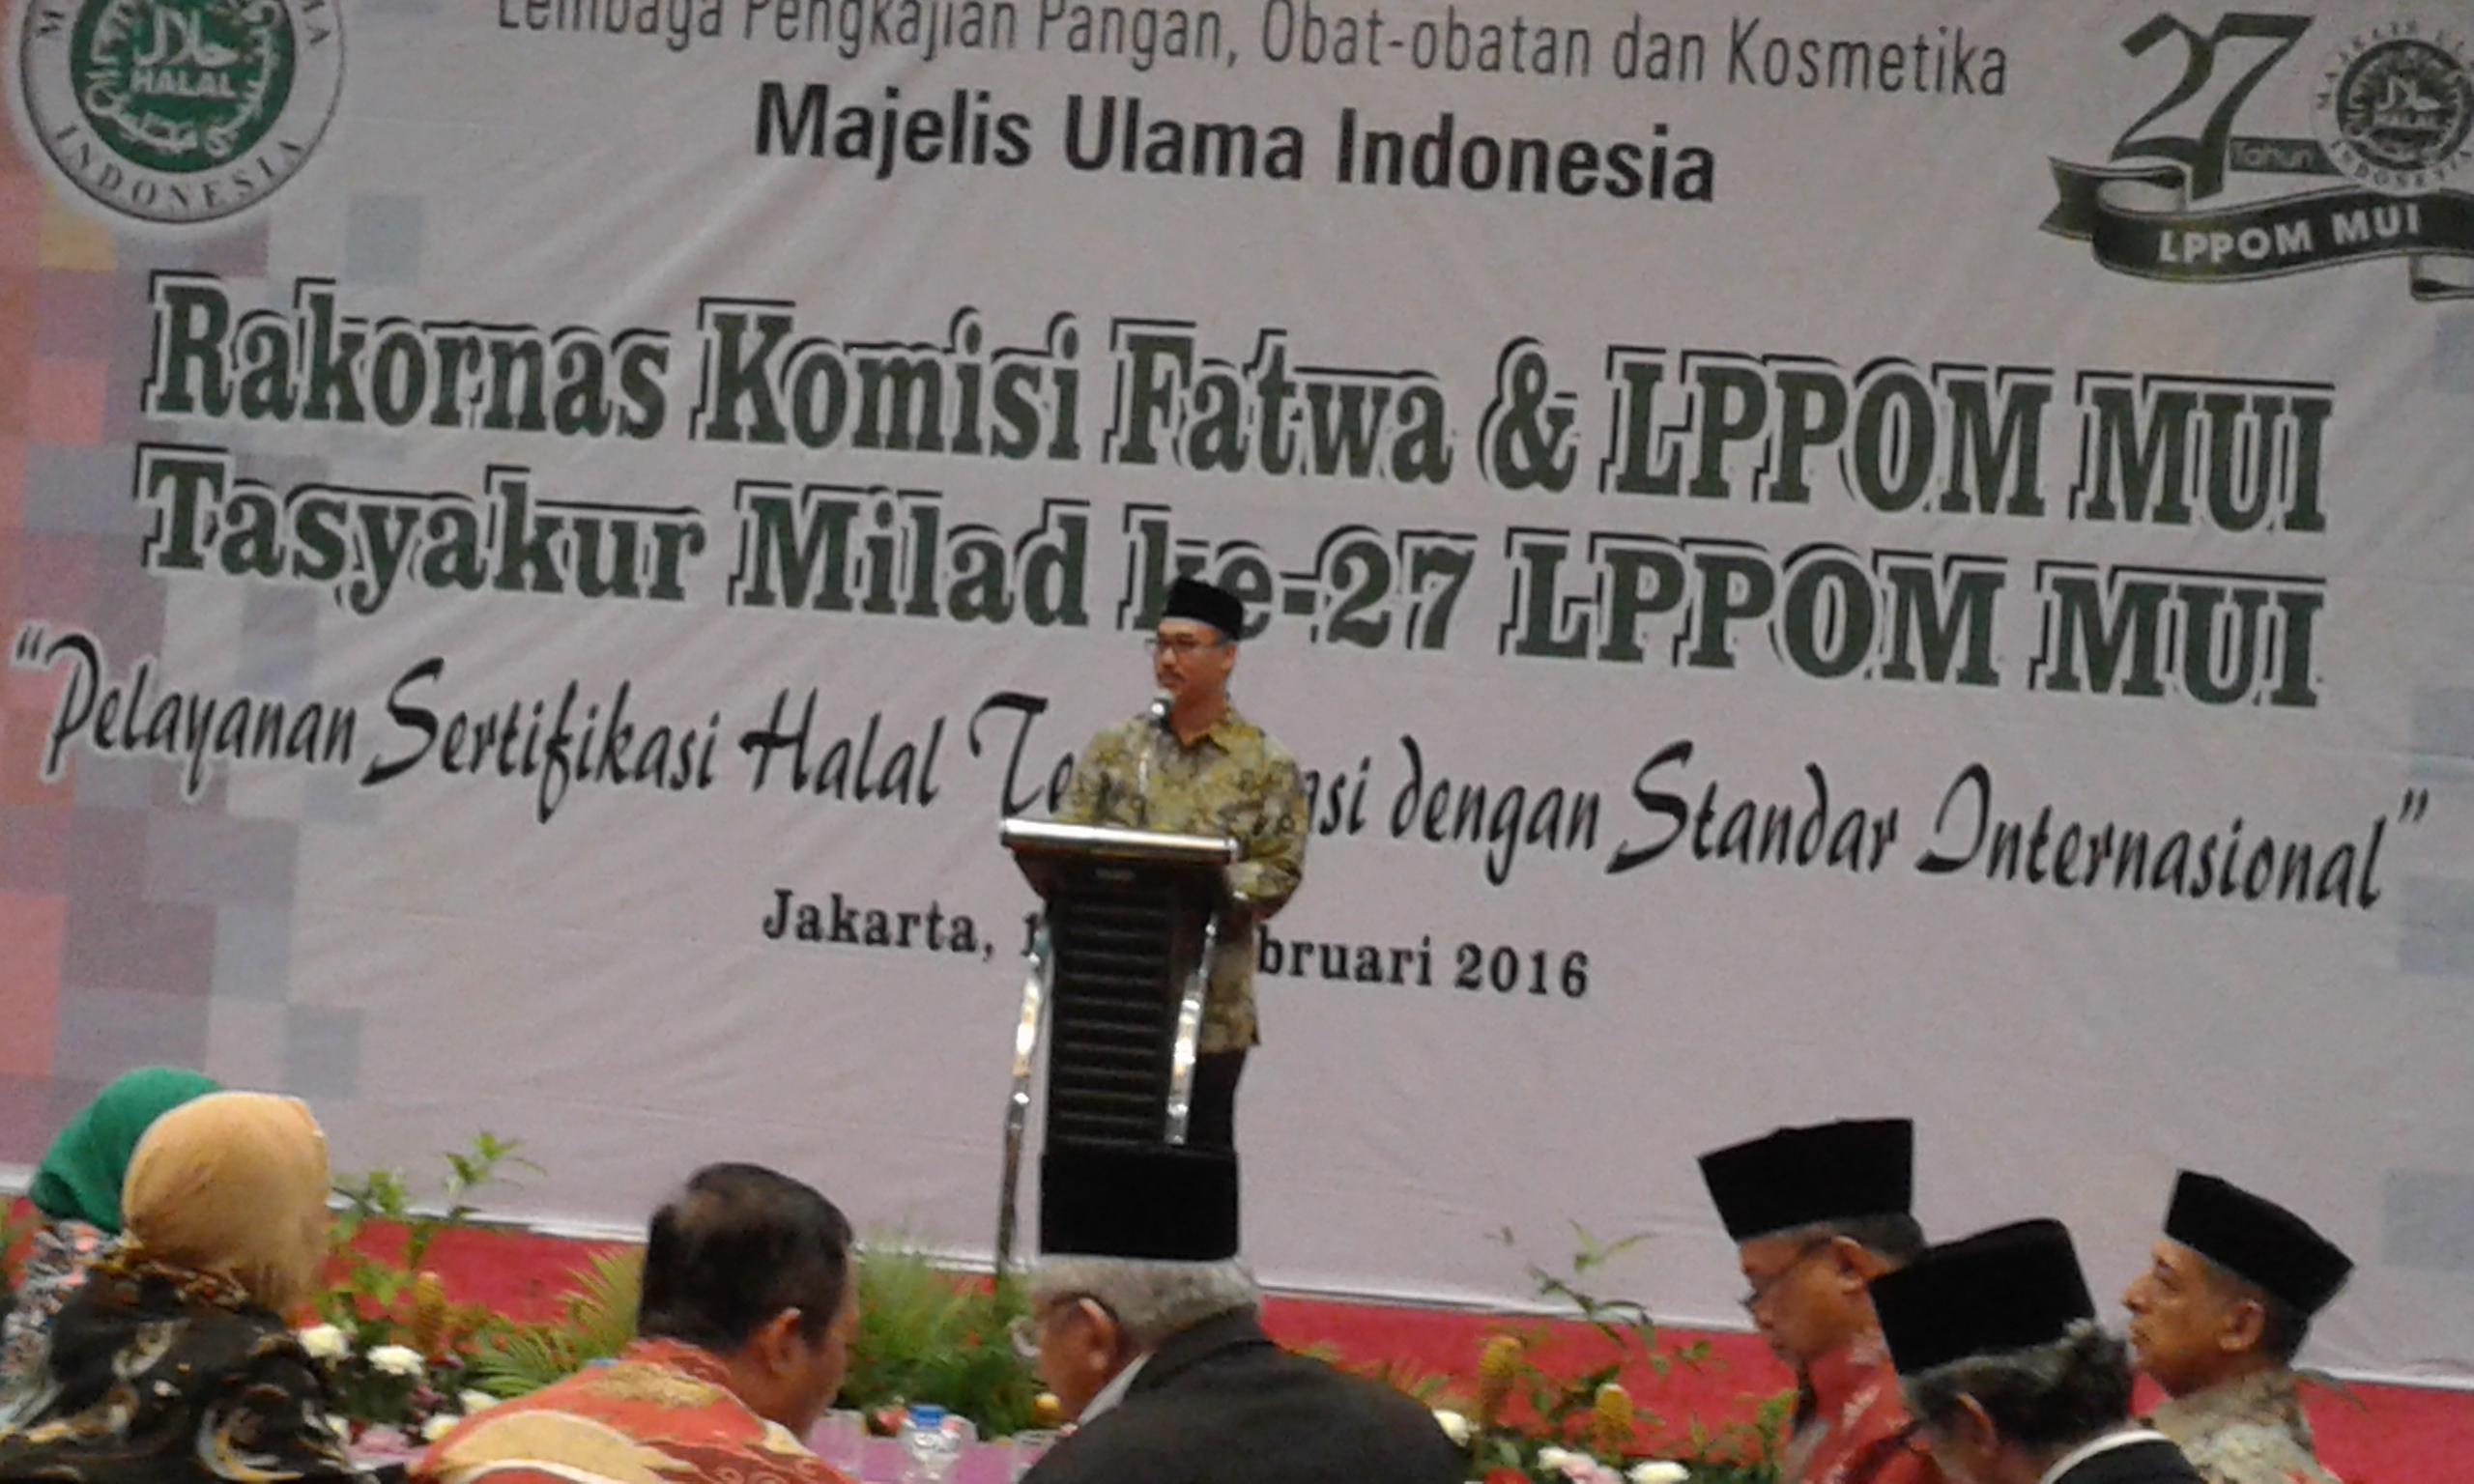 Lukmanul Hakim: Auditor Halal Harus Disertifikasi MUI